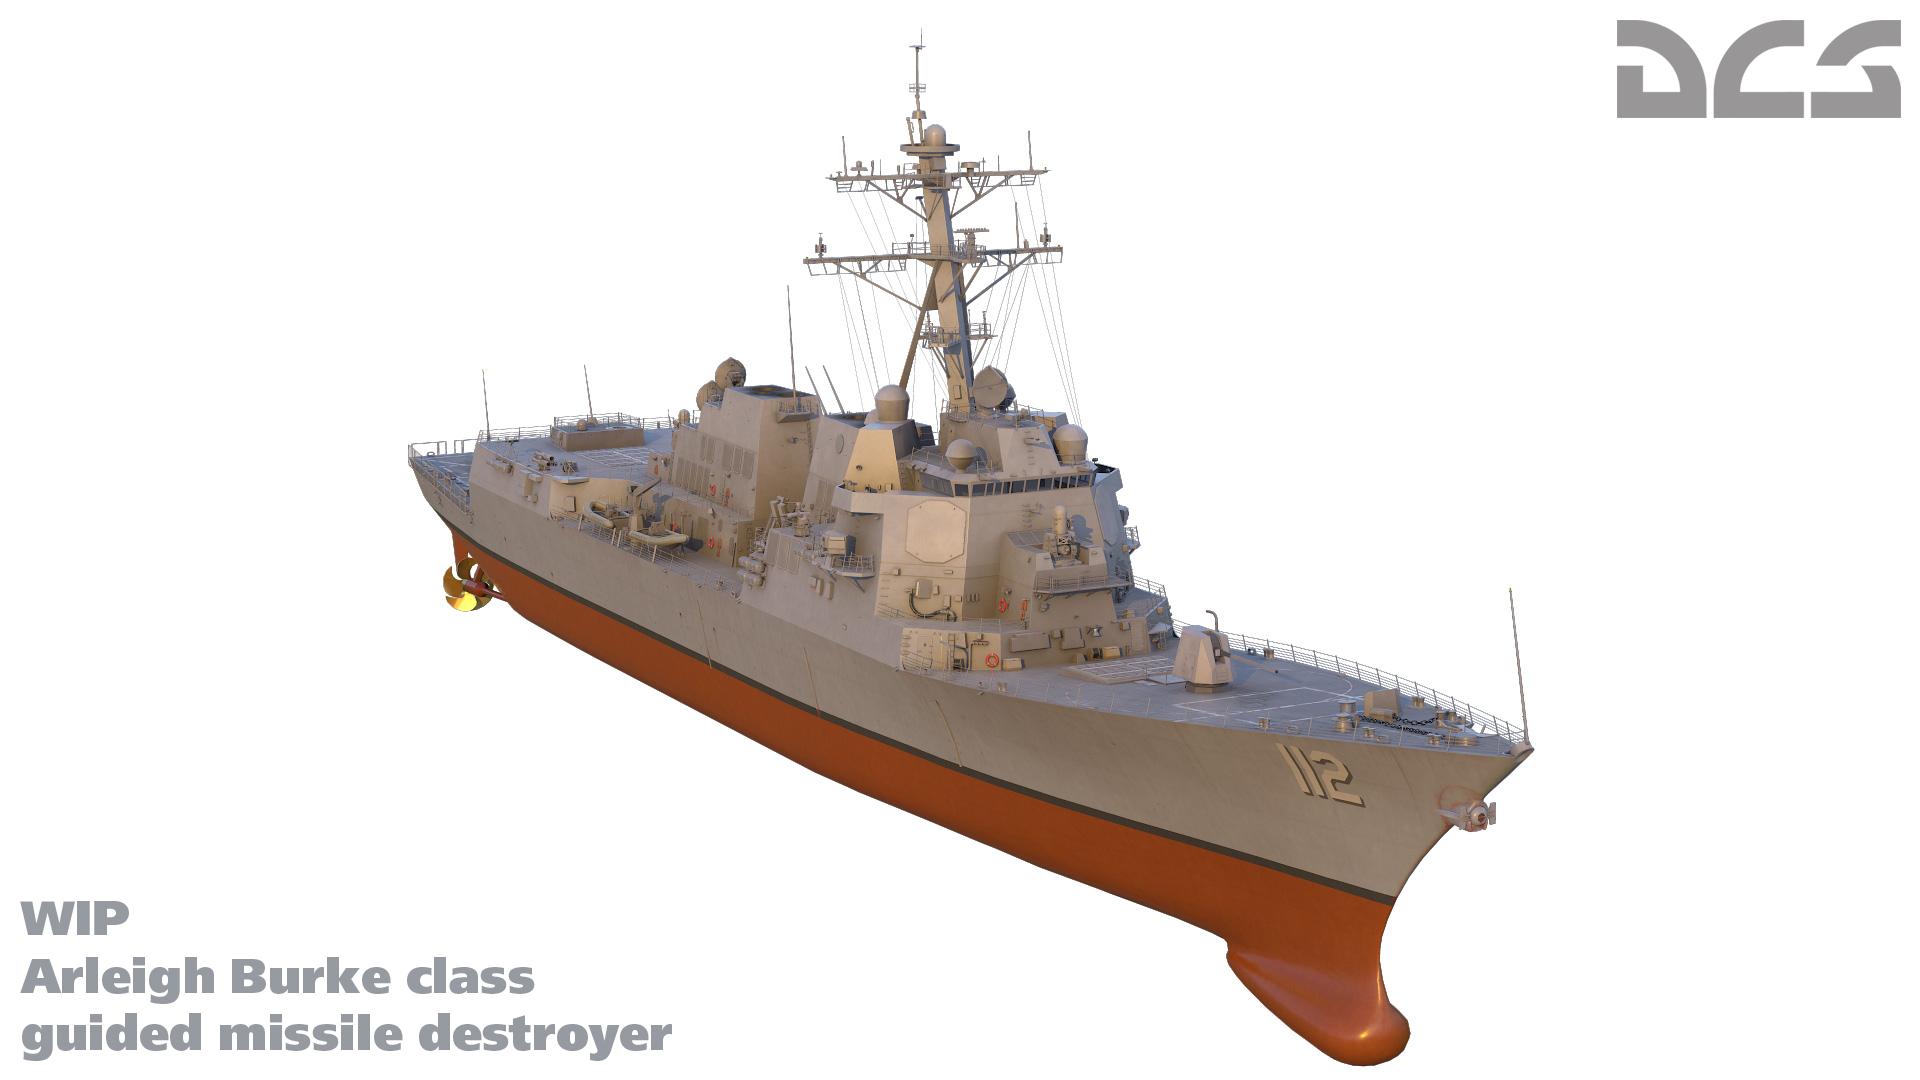 www.digitalcombatsimulator.com/upload/iblock/85f/DCS-Arleigh-Burke-class-01.jpg